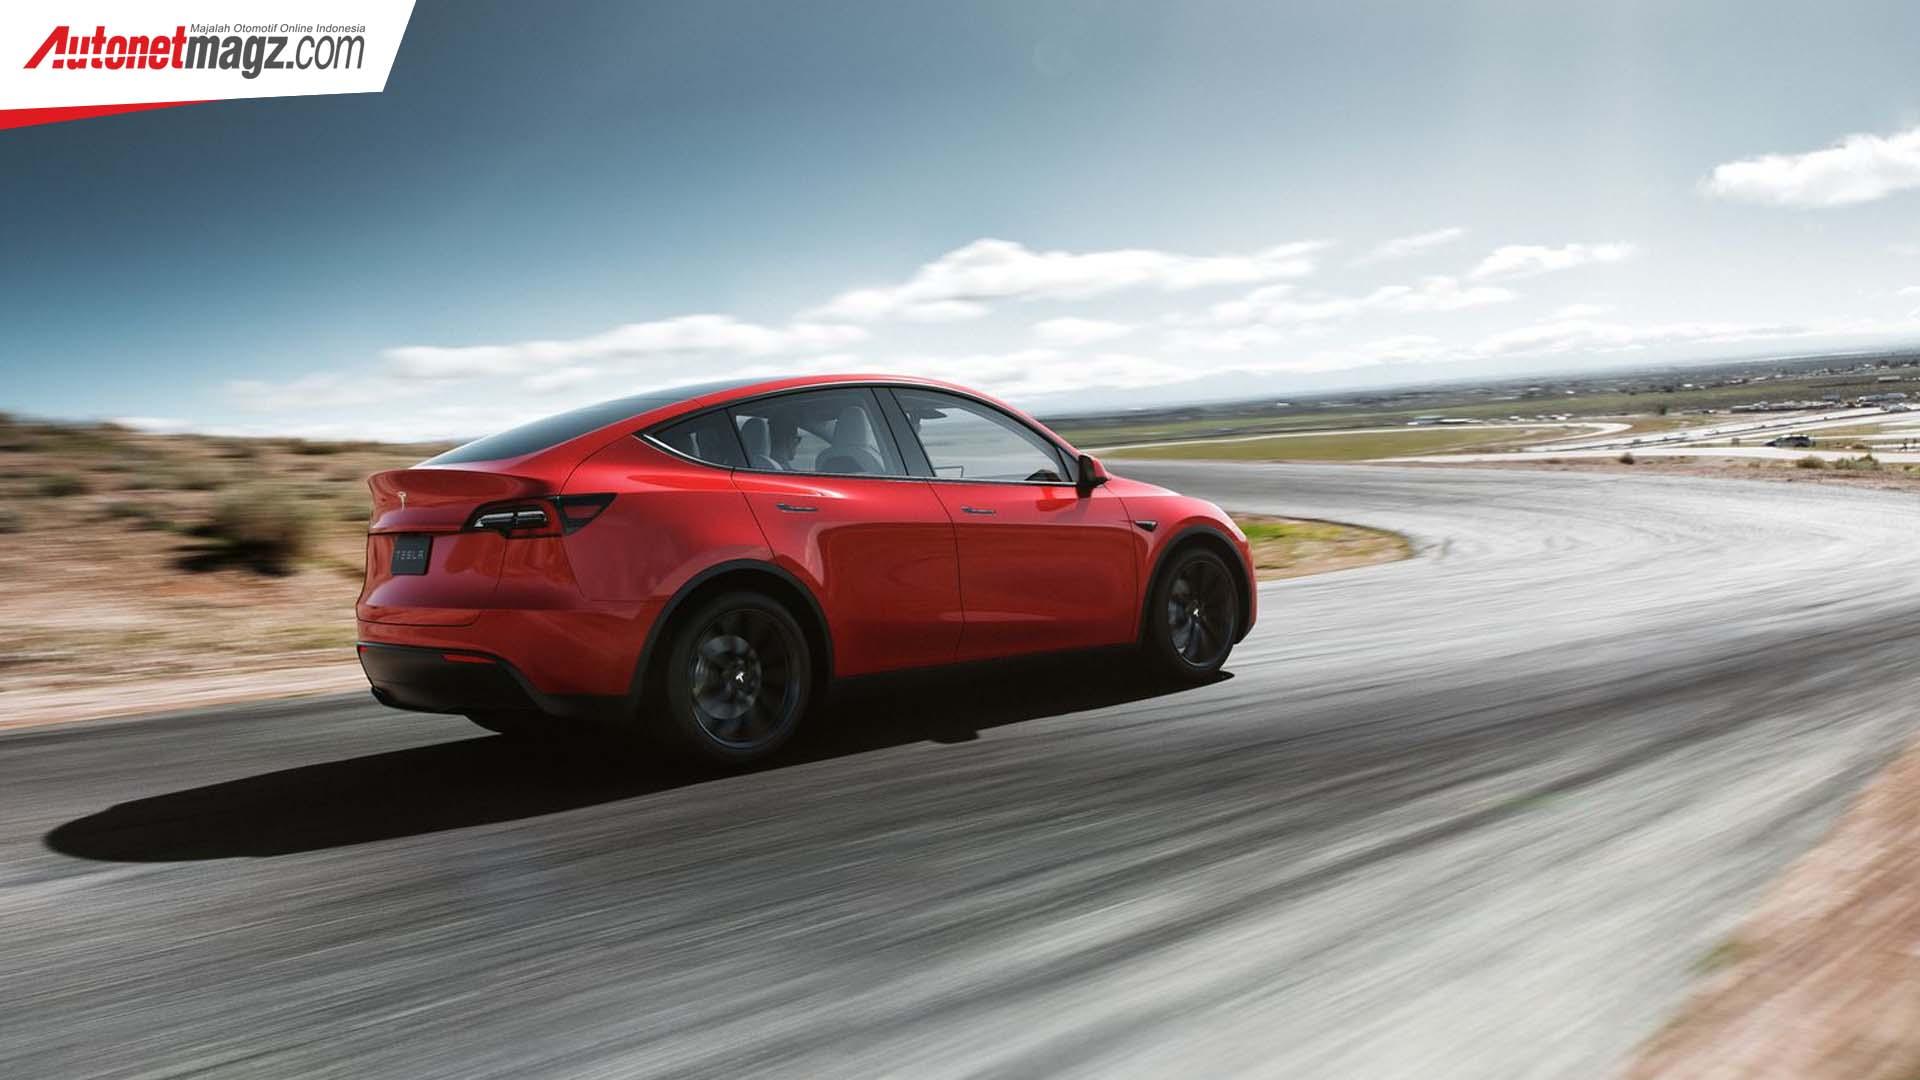 Tesla Buka Peluang Gigafactory Kedua Di Asia Korsel Atau Jepang Autonetmagz